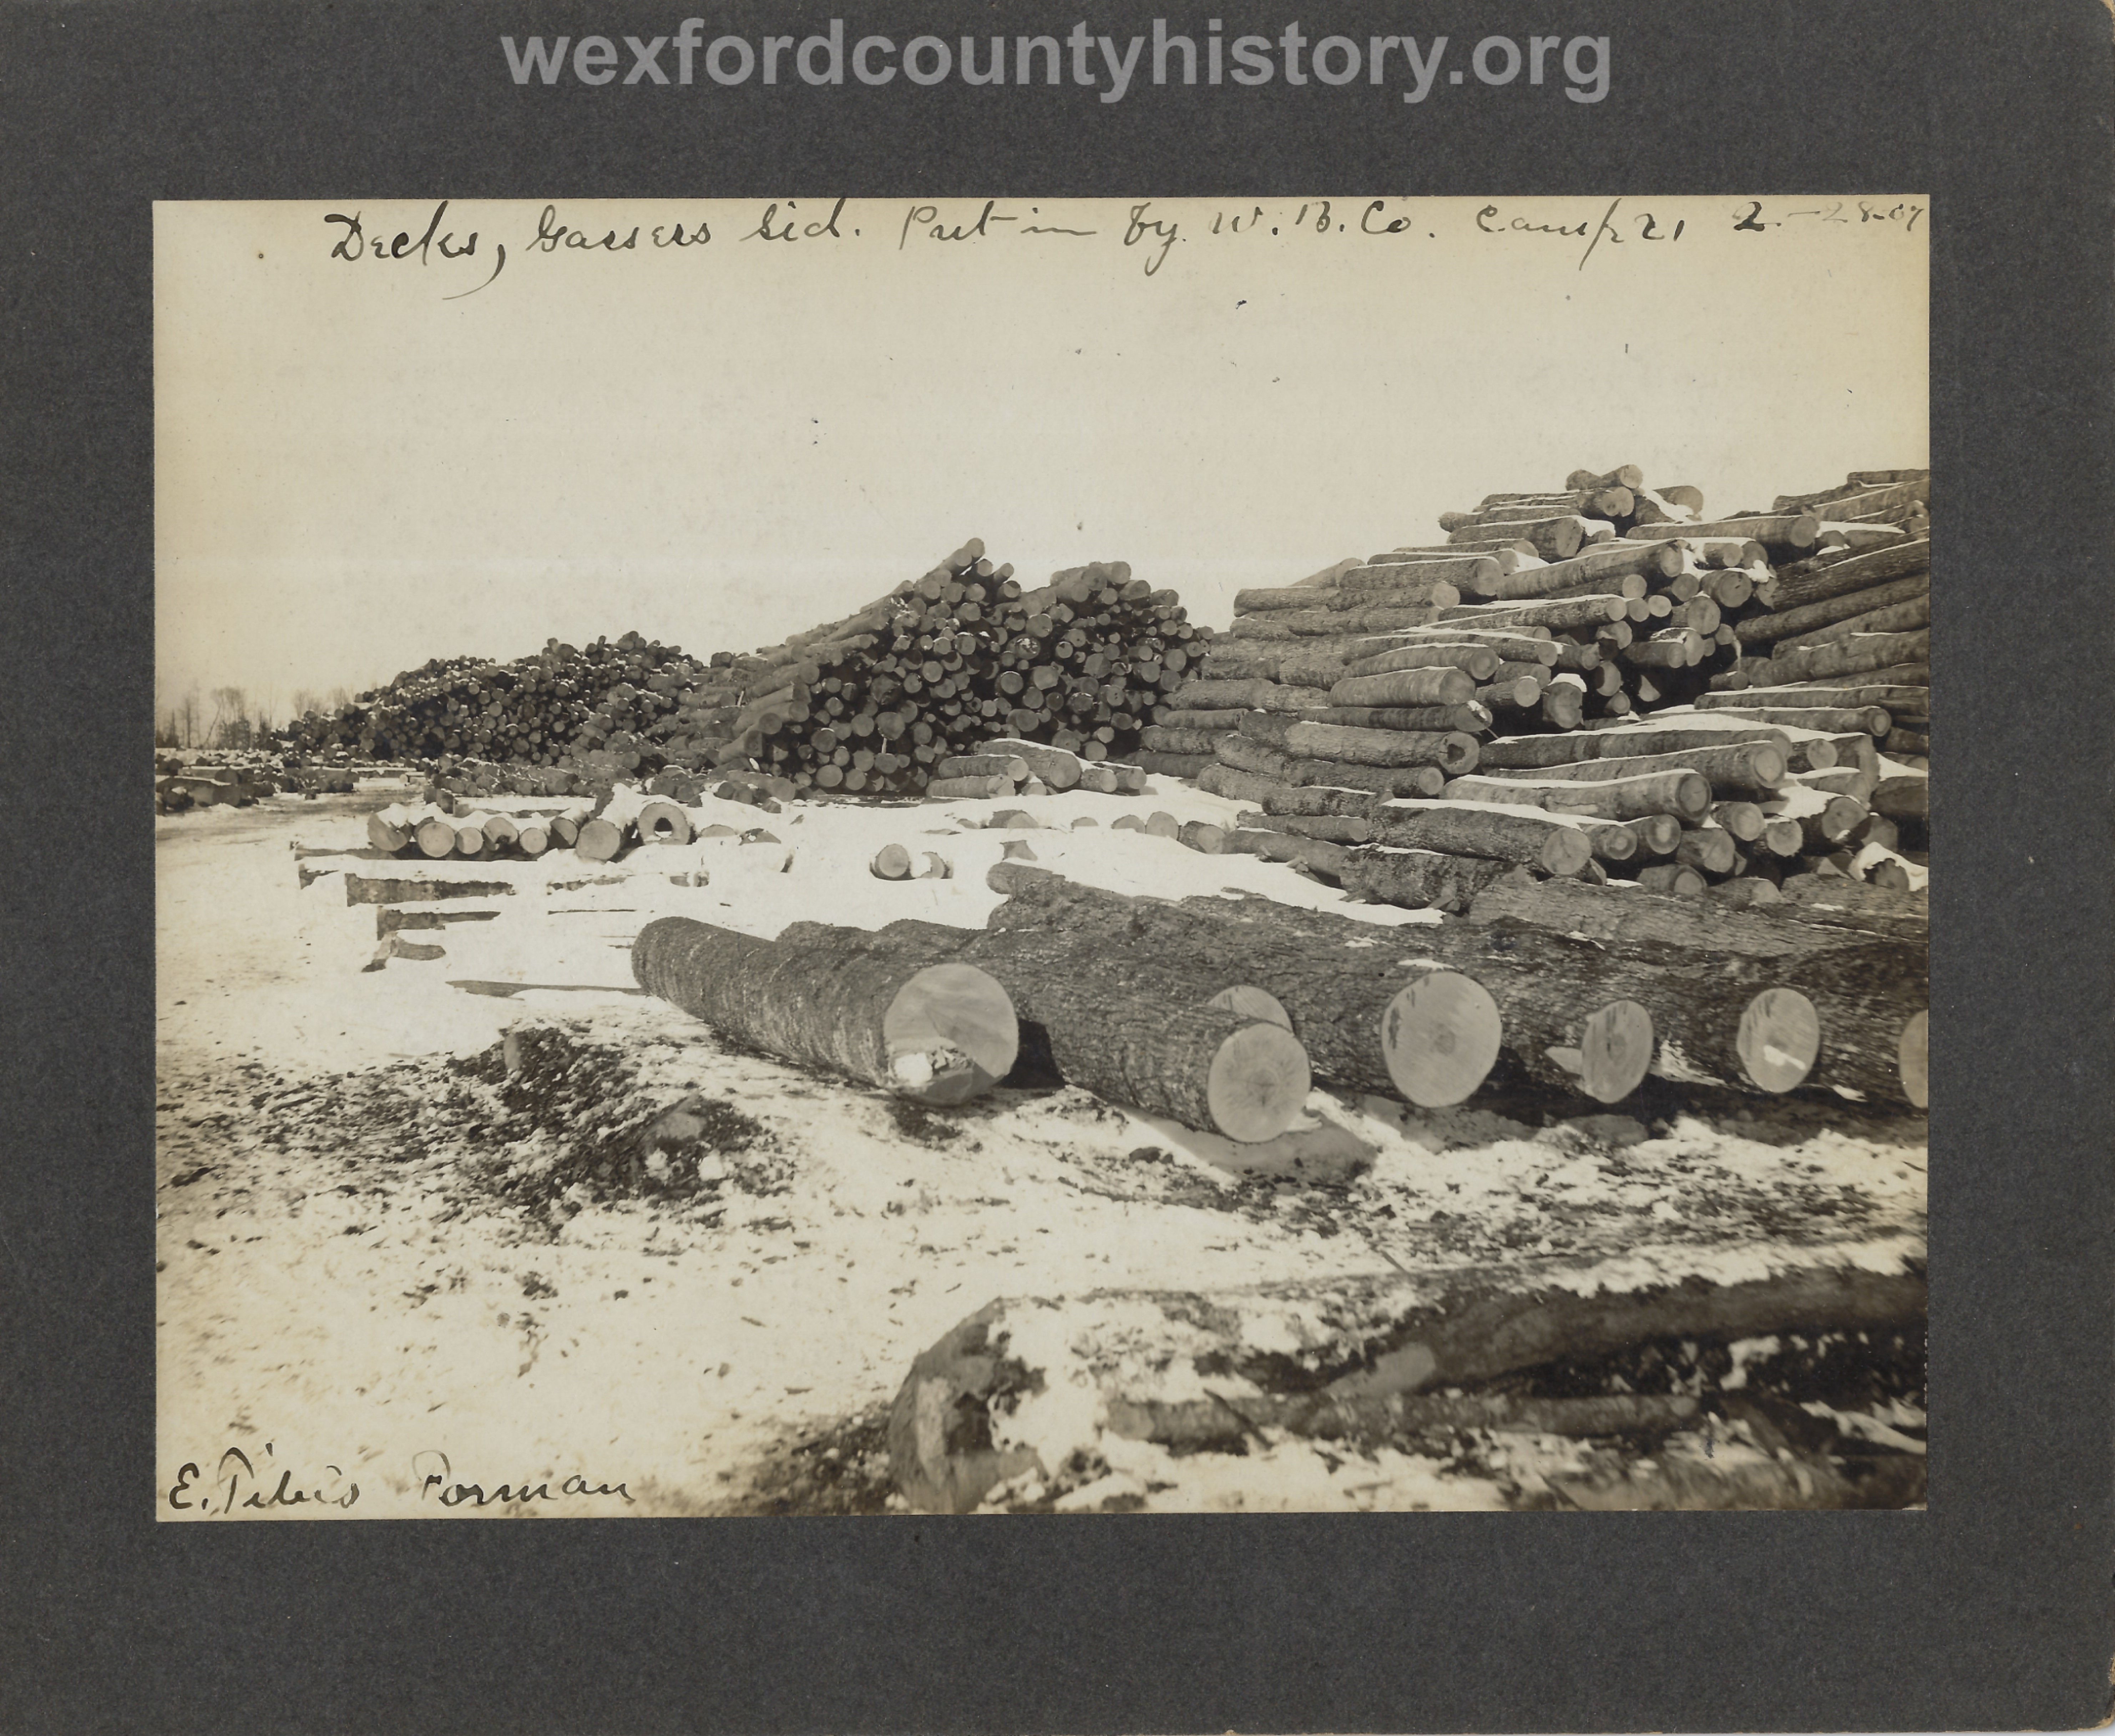 Cadillac-Lumber-Williams-Brothers-Company-Camp-Near-Harrietta-Log-Deck-at-Gassers-Siding-Cut-And-Hauled-By-Williams-Brothers-Company-Camp-21-Feb-28-1907